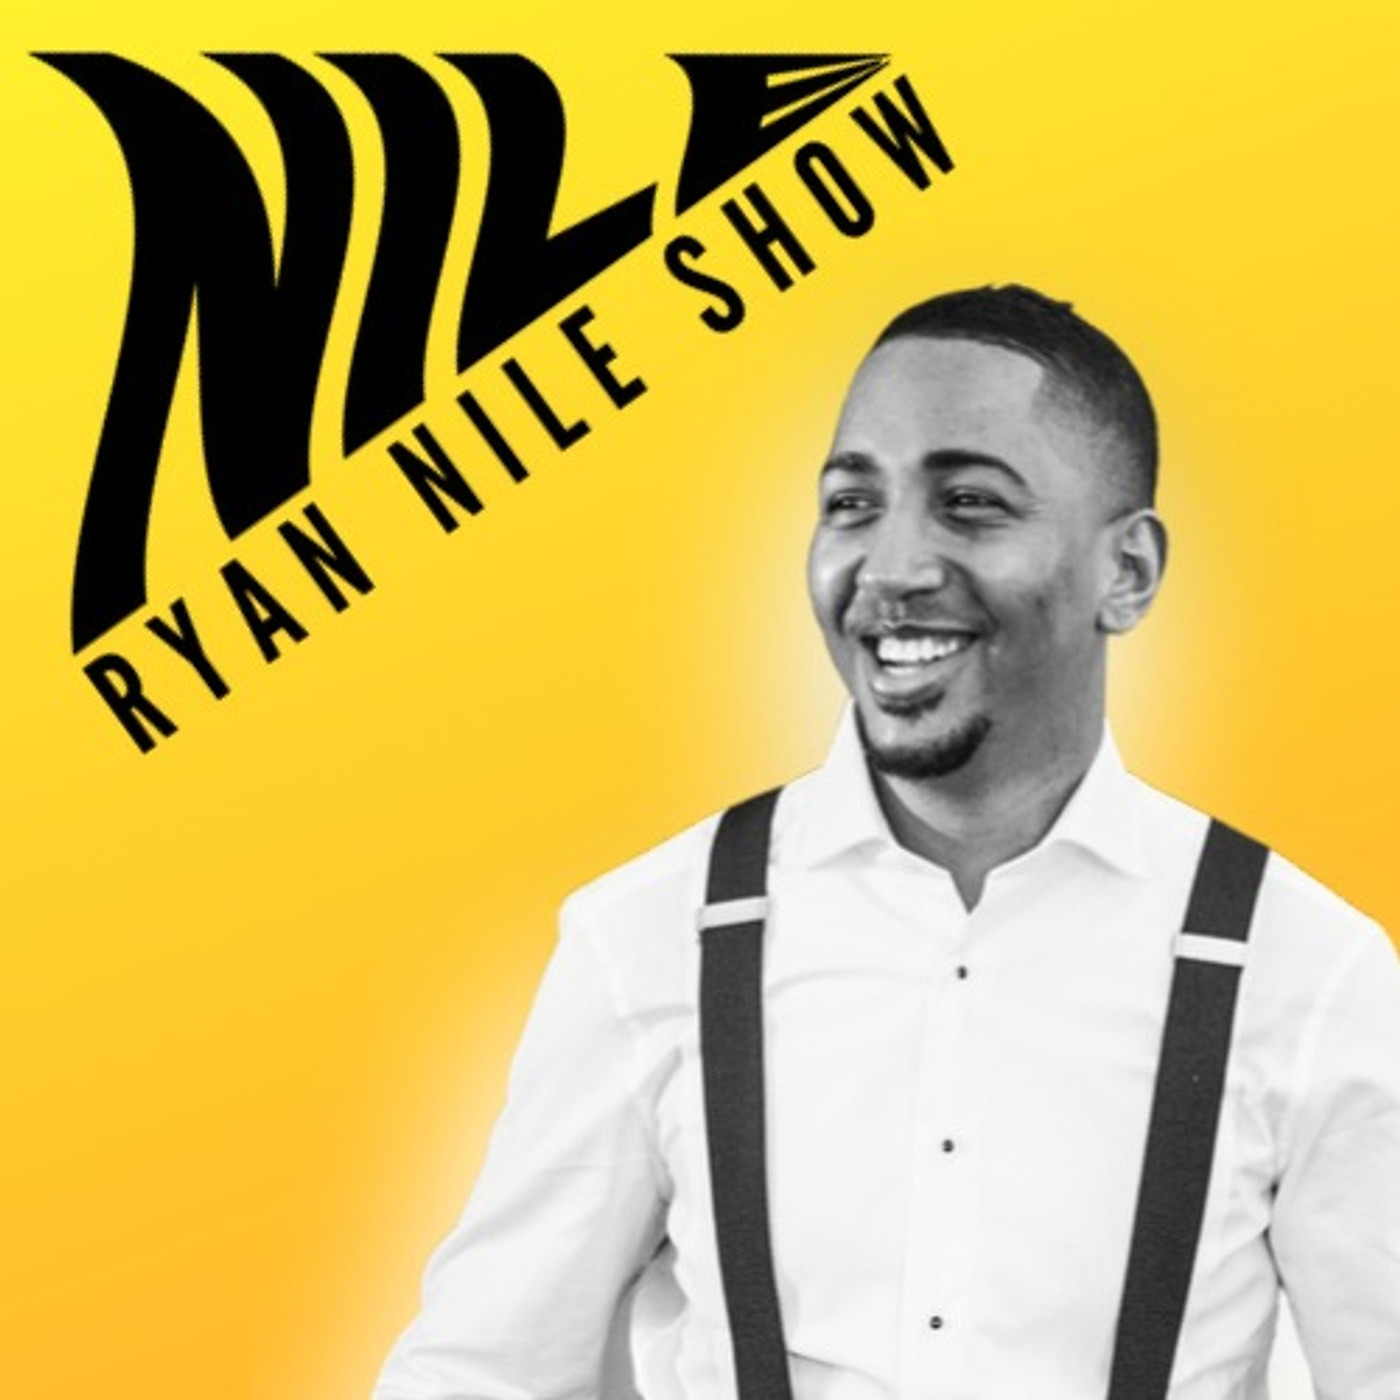 Ryan Nile